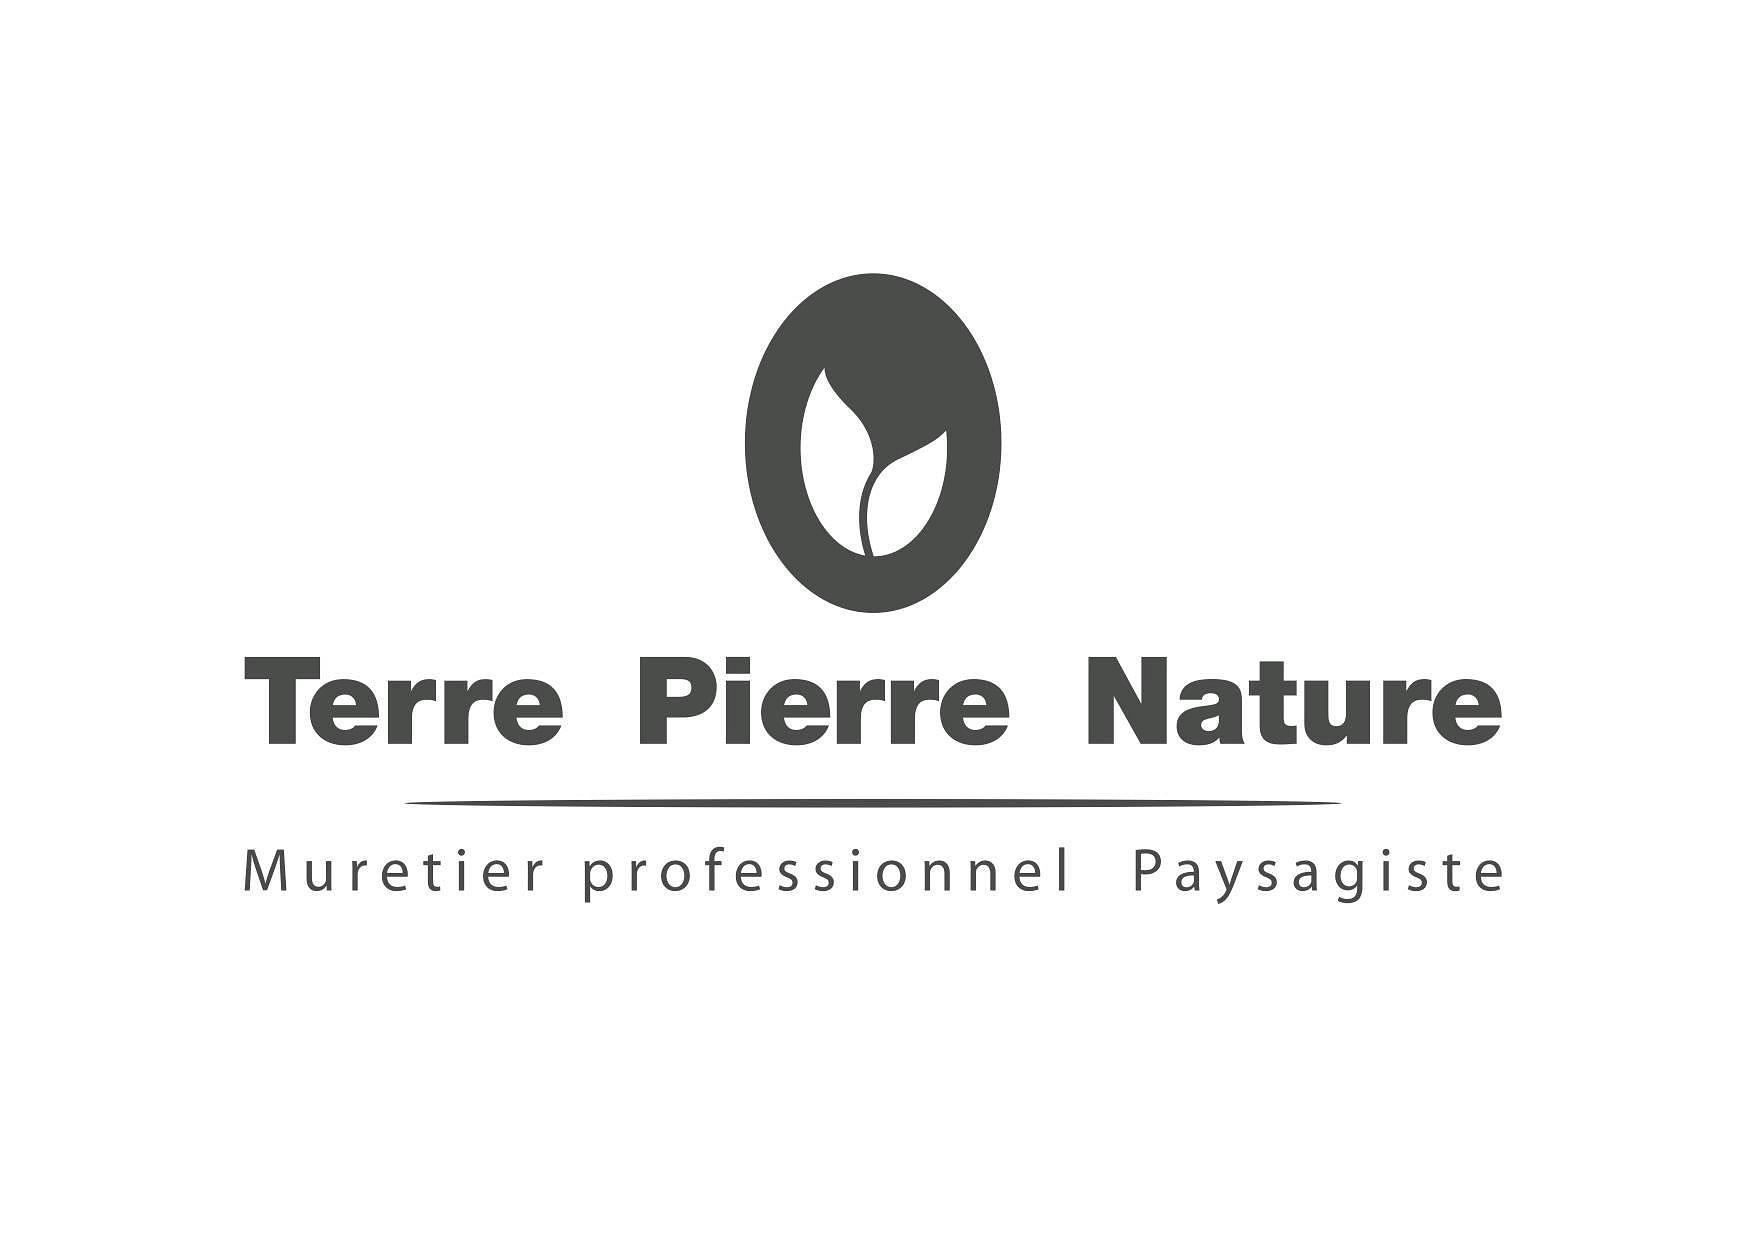 Terre Pierre Nature